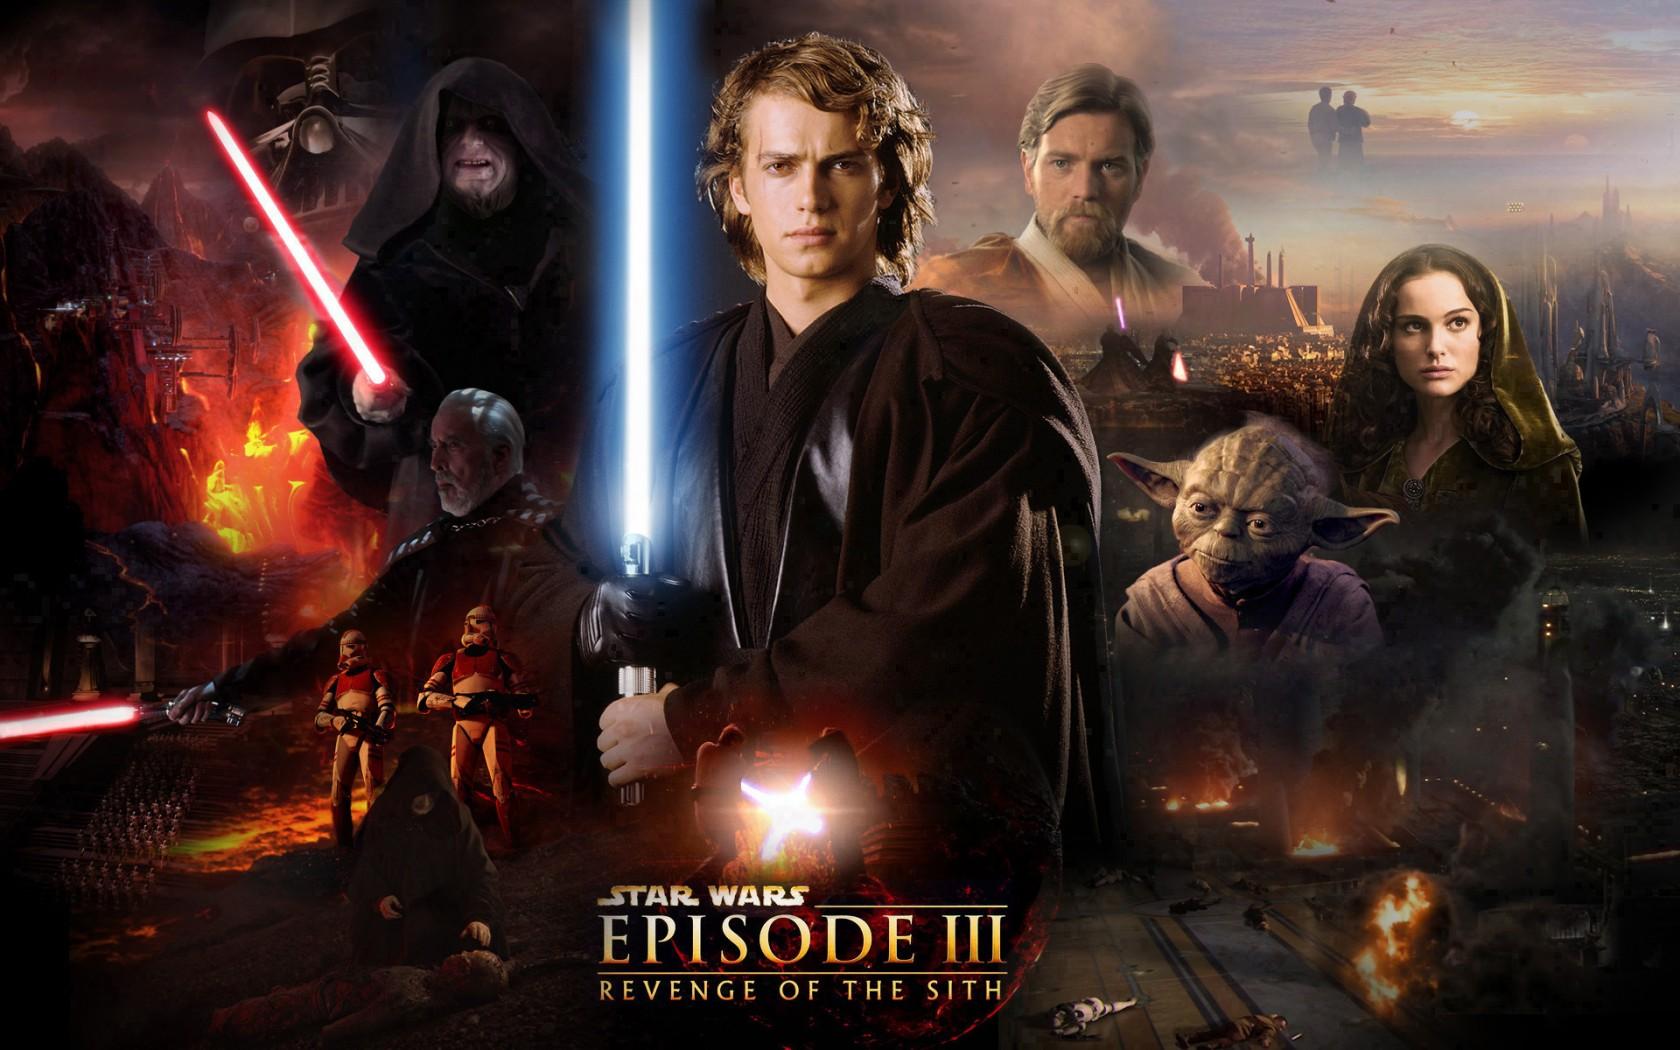 Star Wars Wallpaper episode 3 revenge of the sith Anakin Skywalker 1680x1050